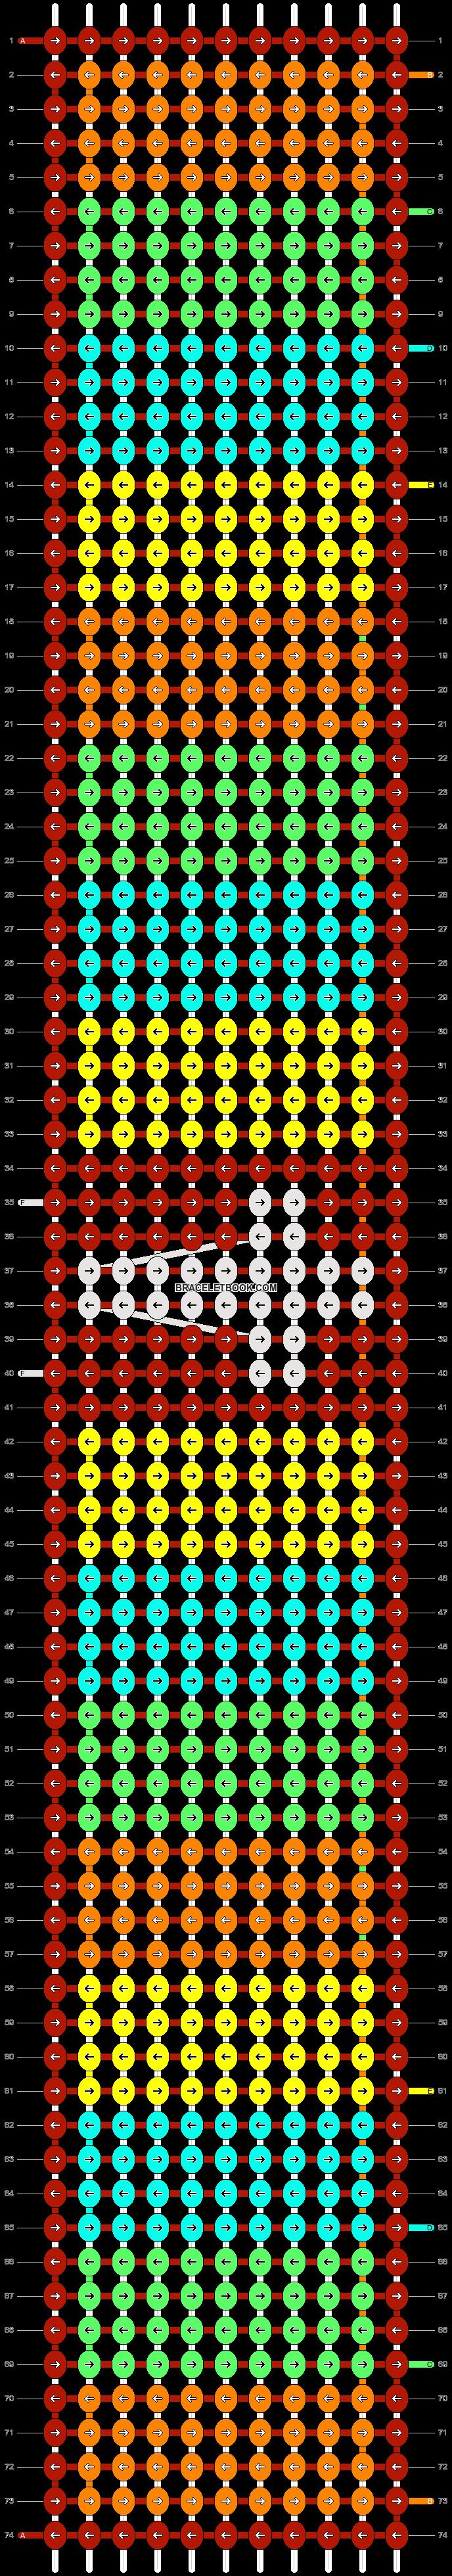 Alpha pattern #9705 pattern